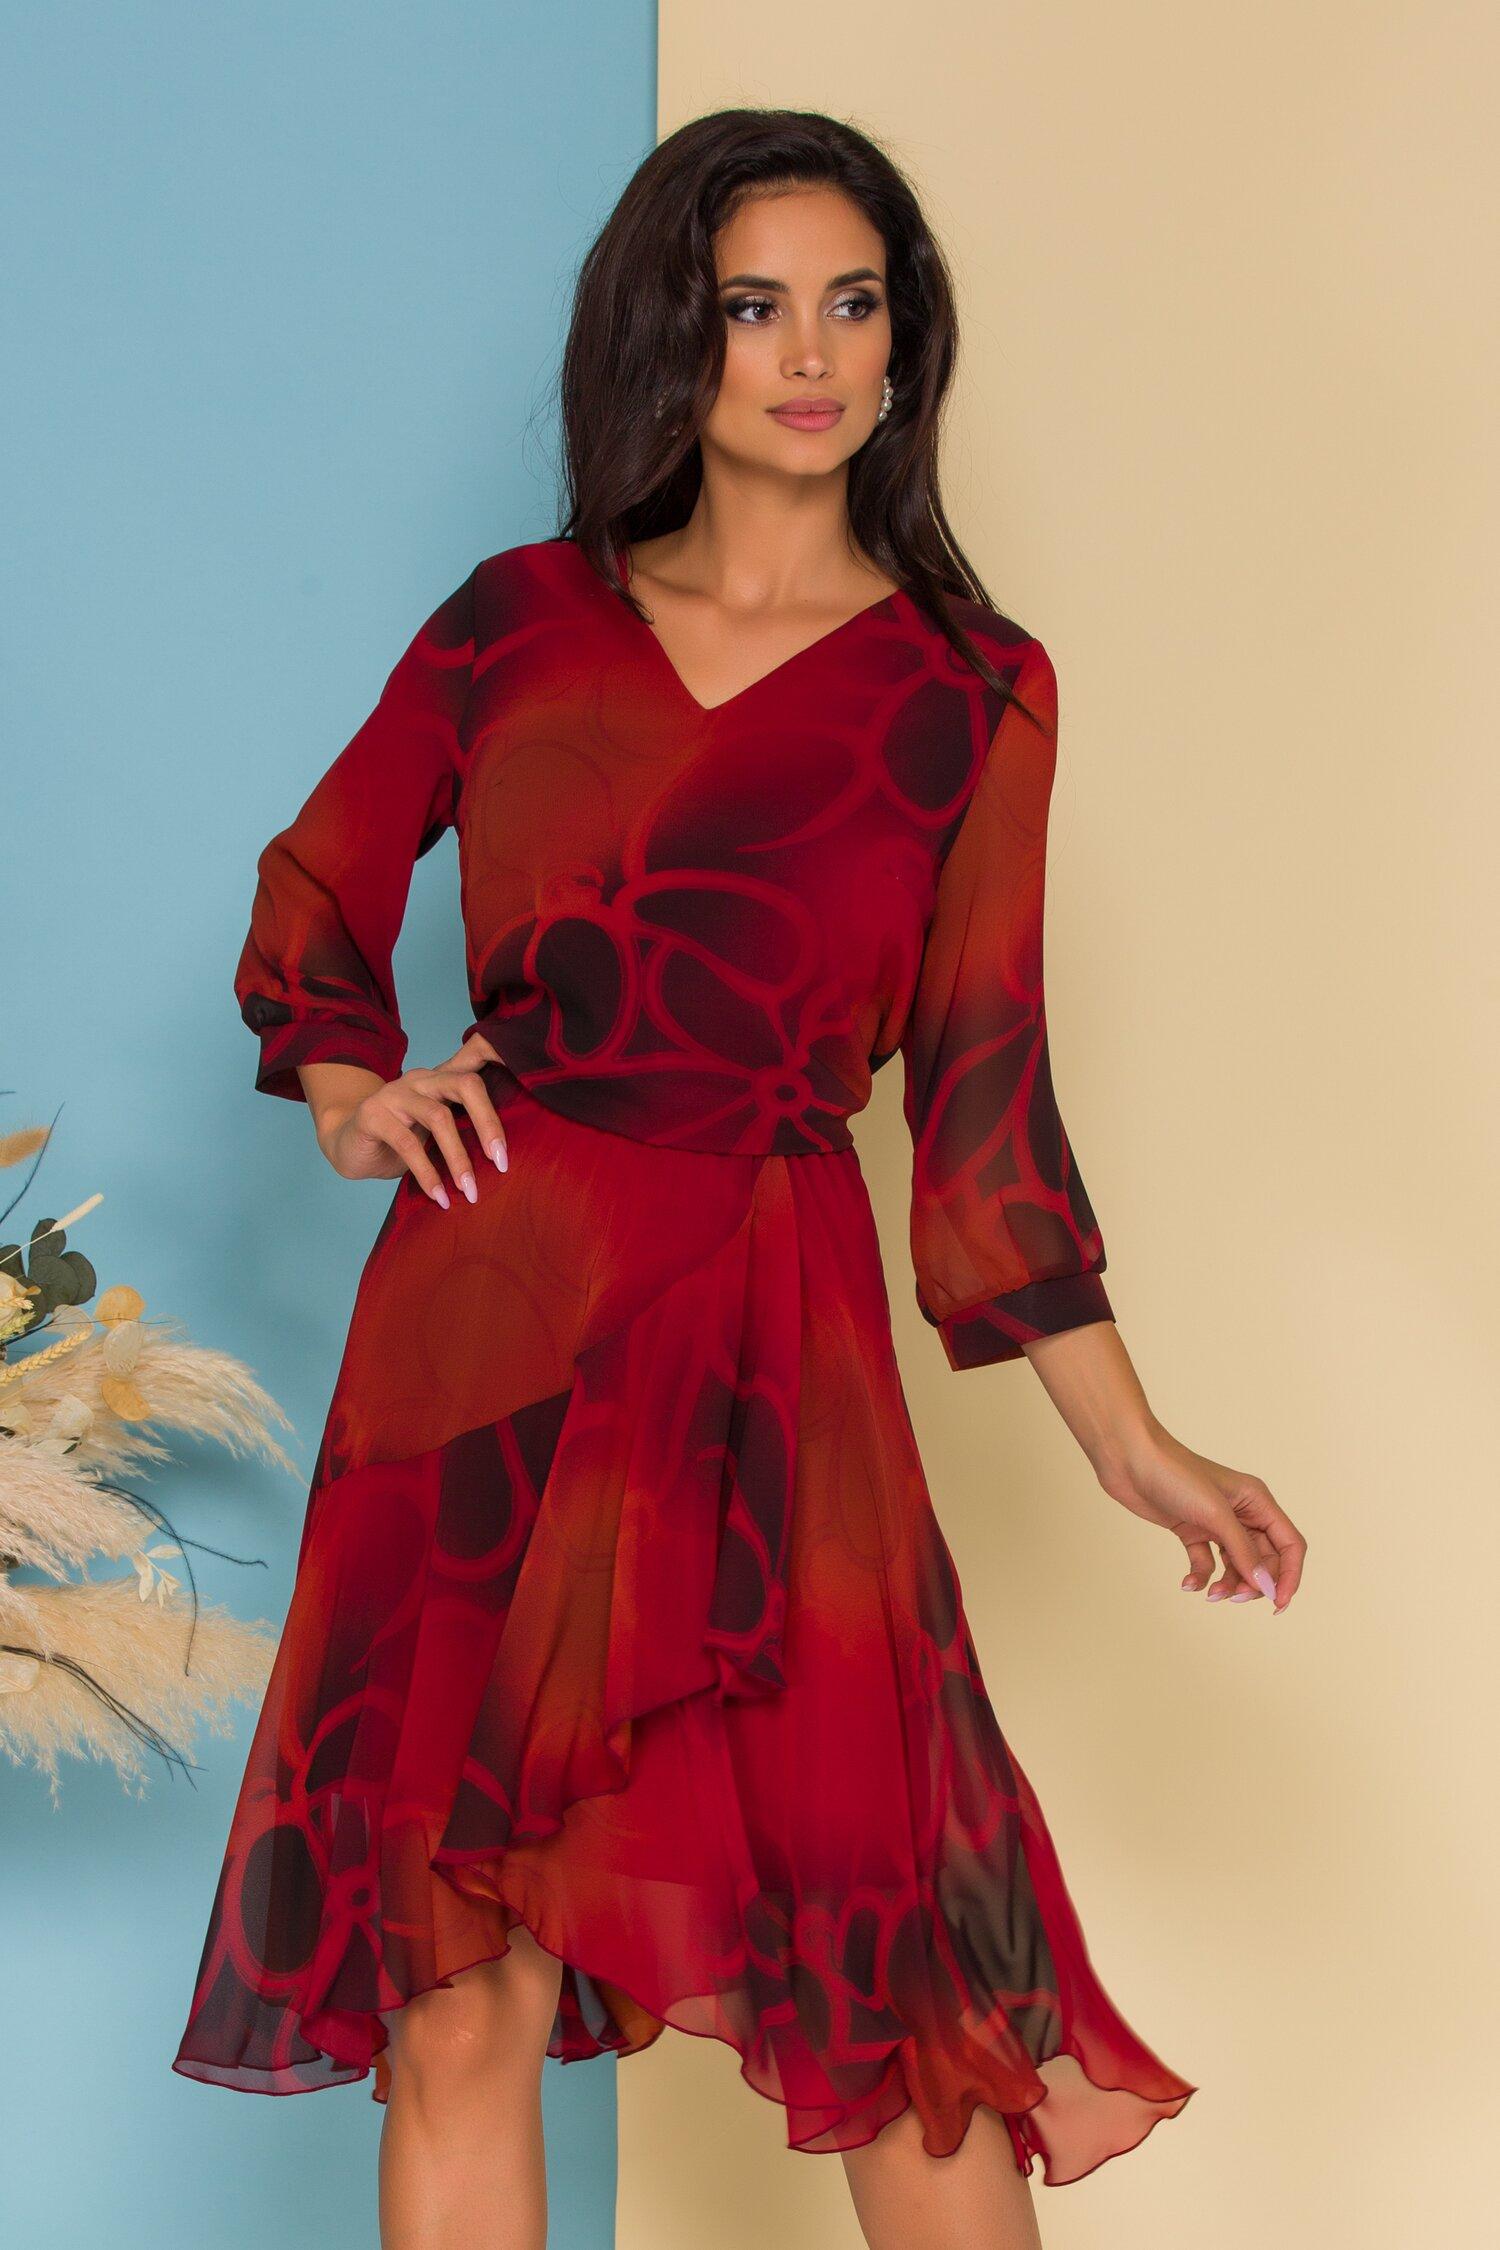 Rochie Bella rosie cu imprimeuri si desgin petrecut pe fusta imagine dyfashion.ro 2021